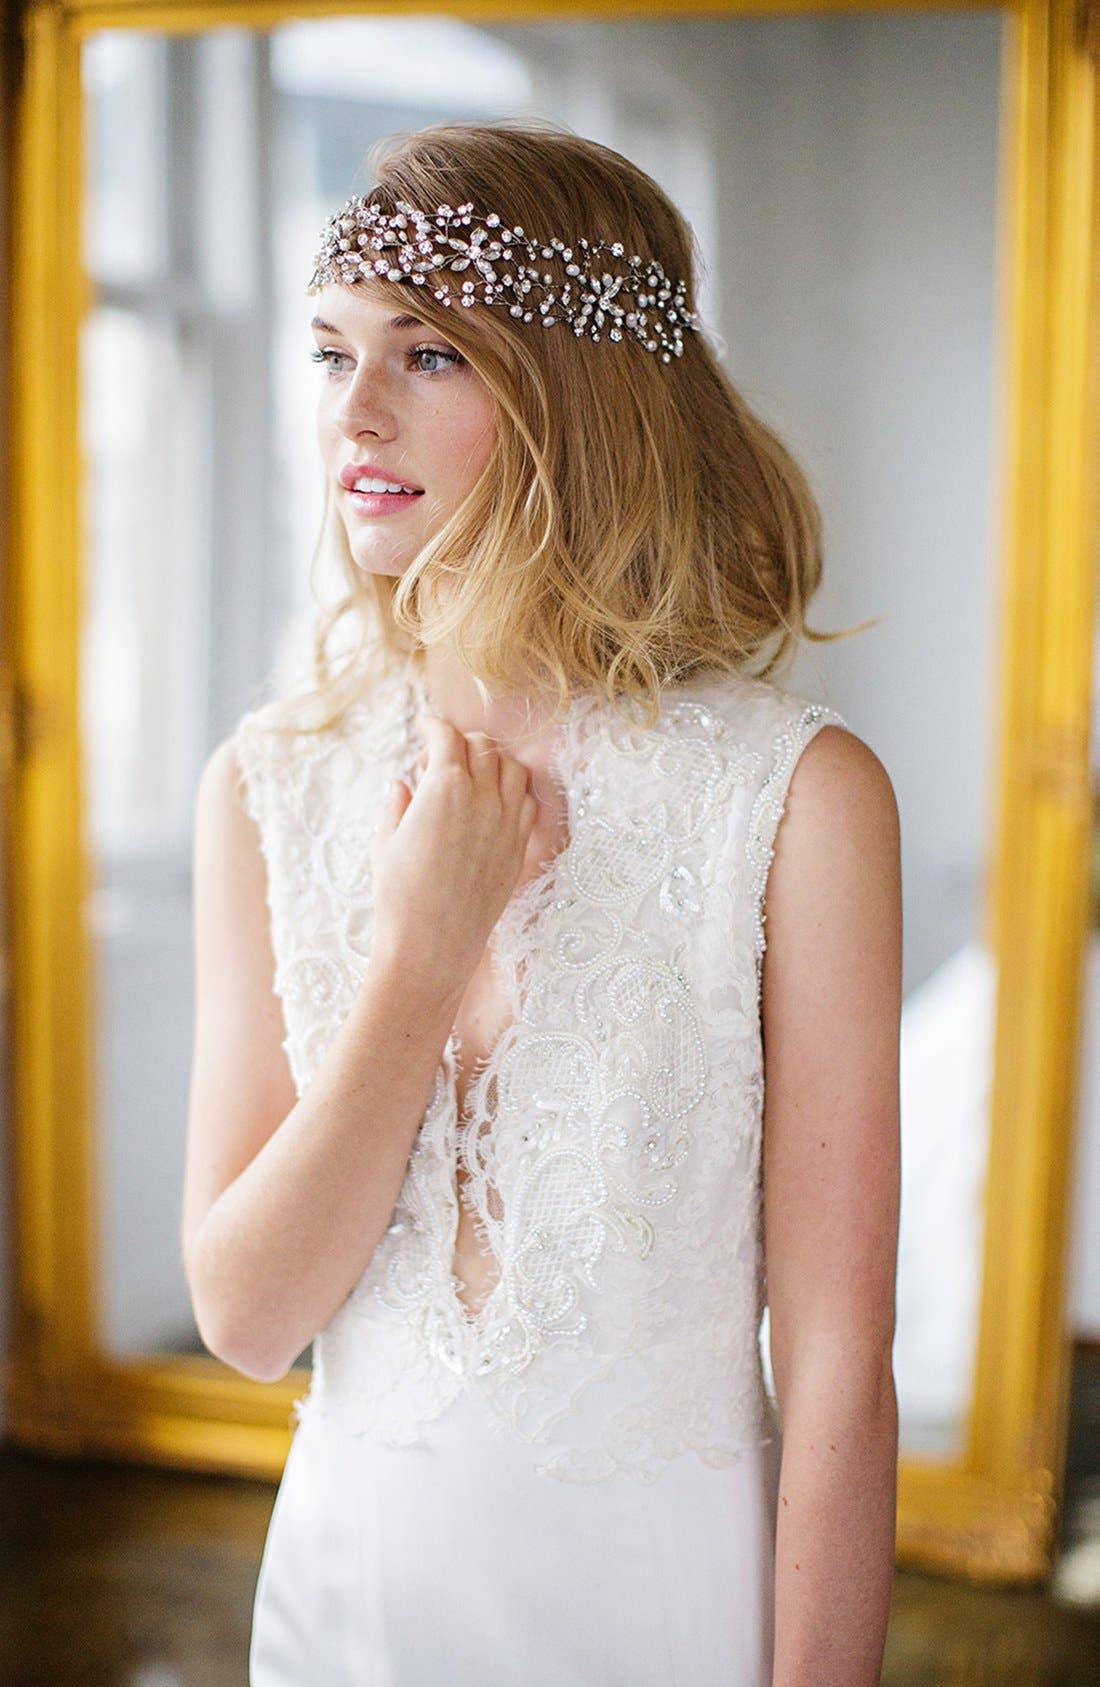 Main Image - Brides & Hairpins 'Thalia' Pearl & Jeweled Head Band